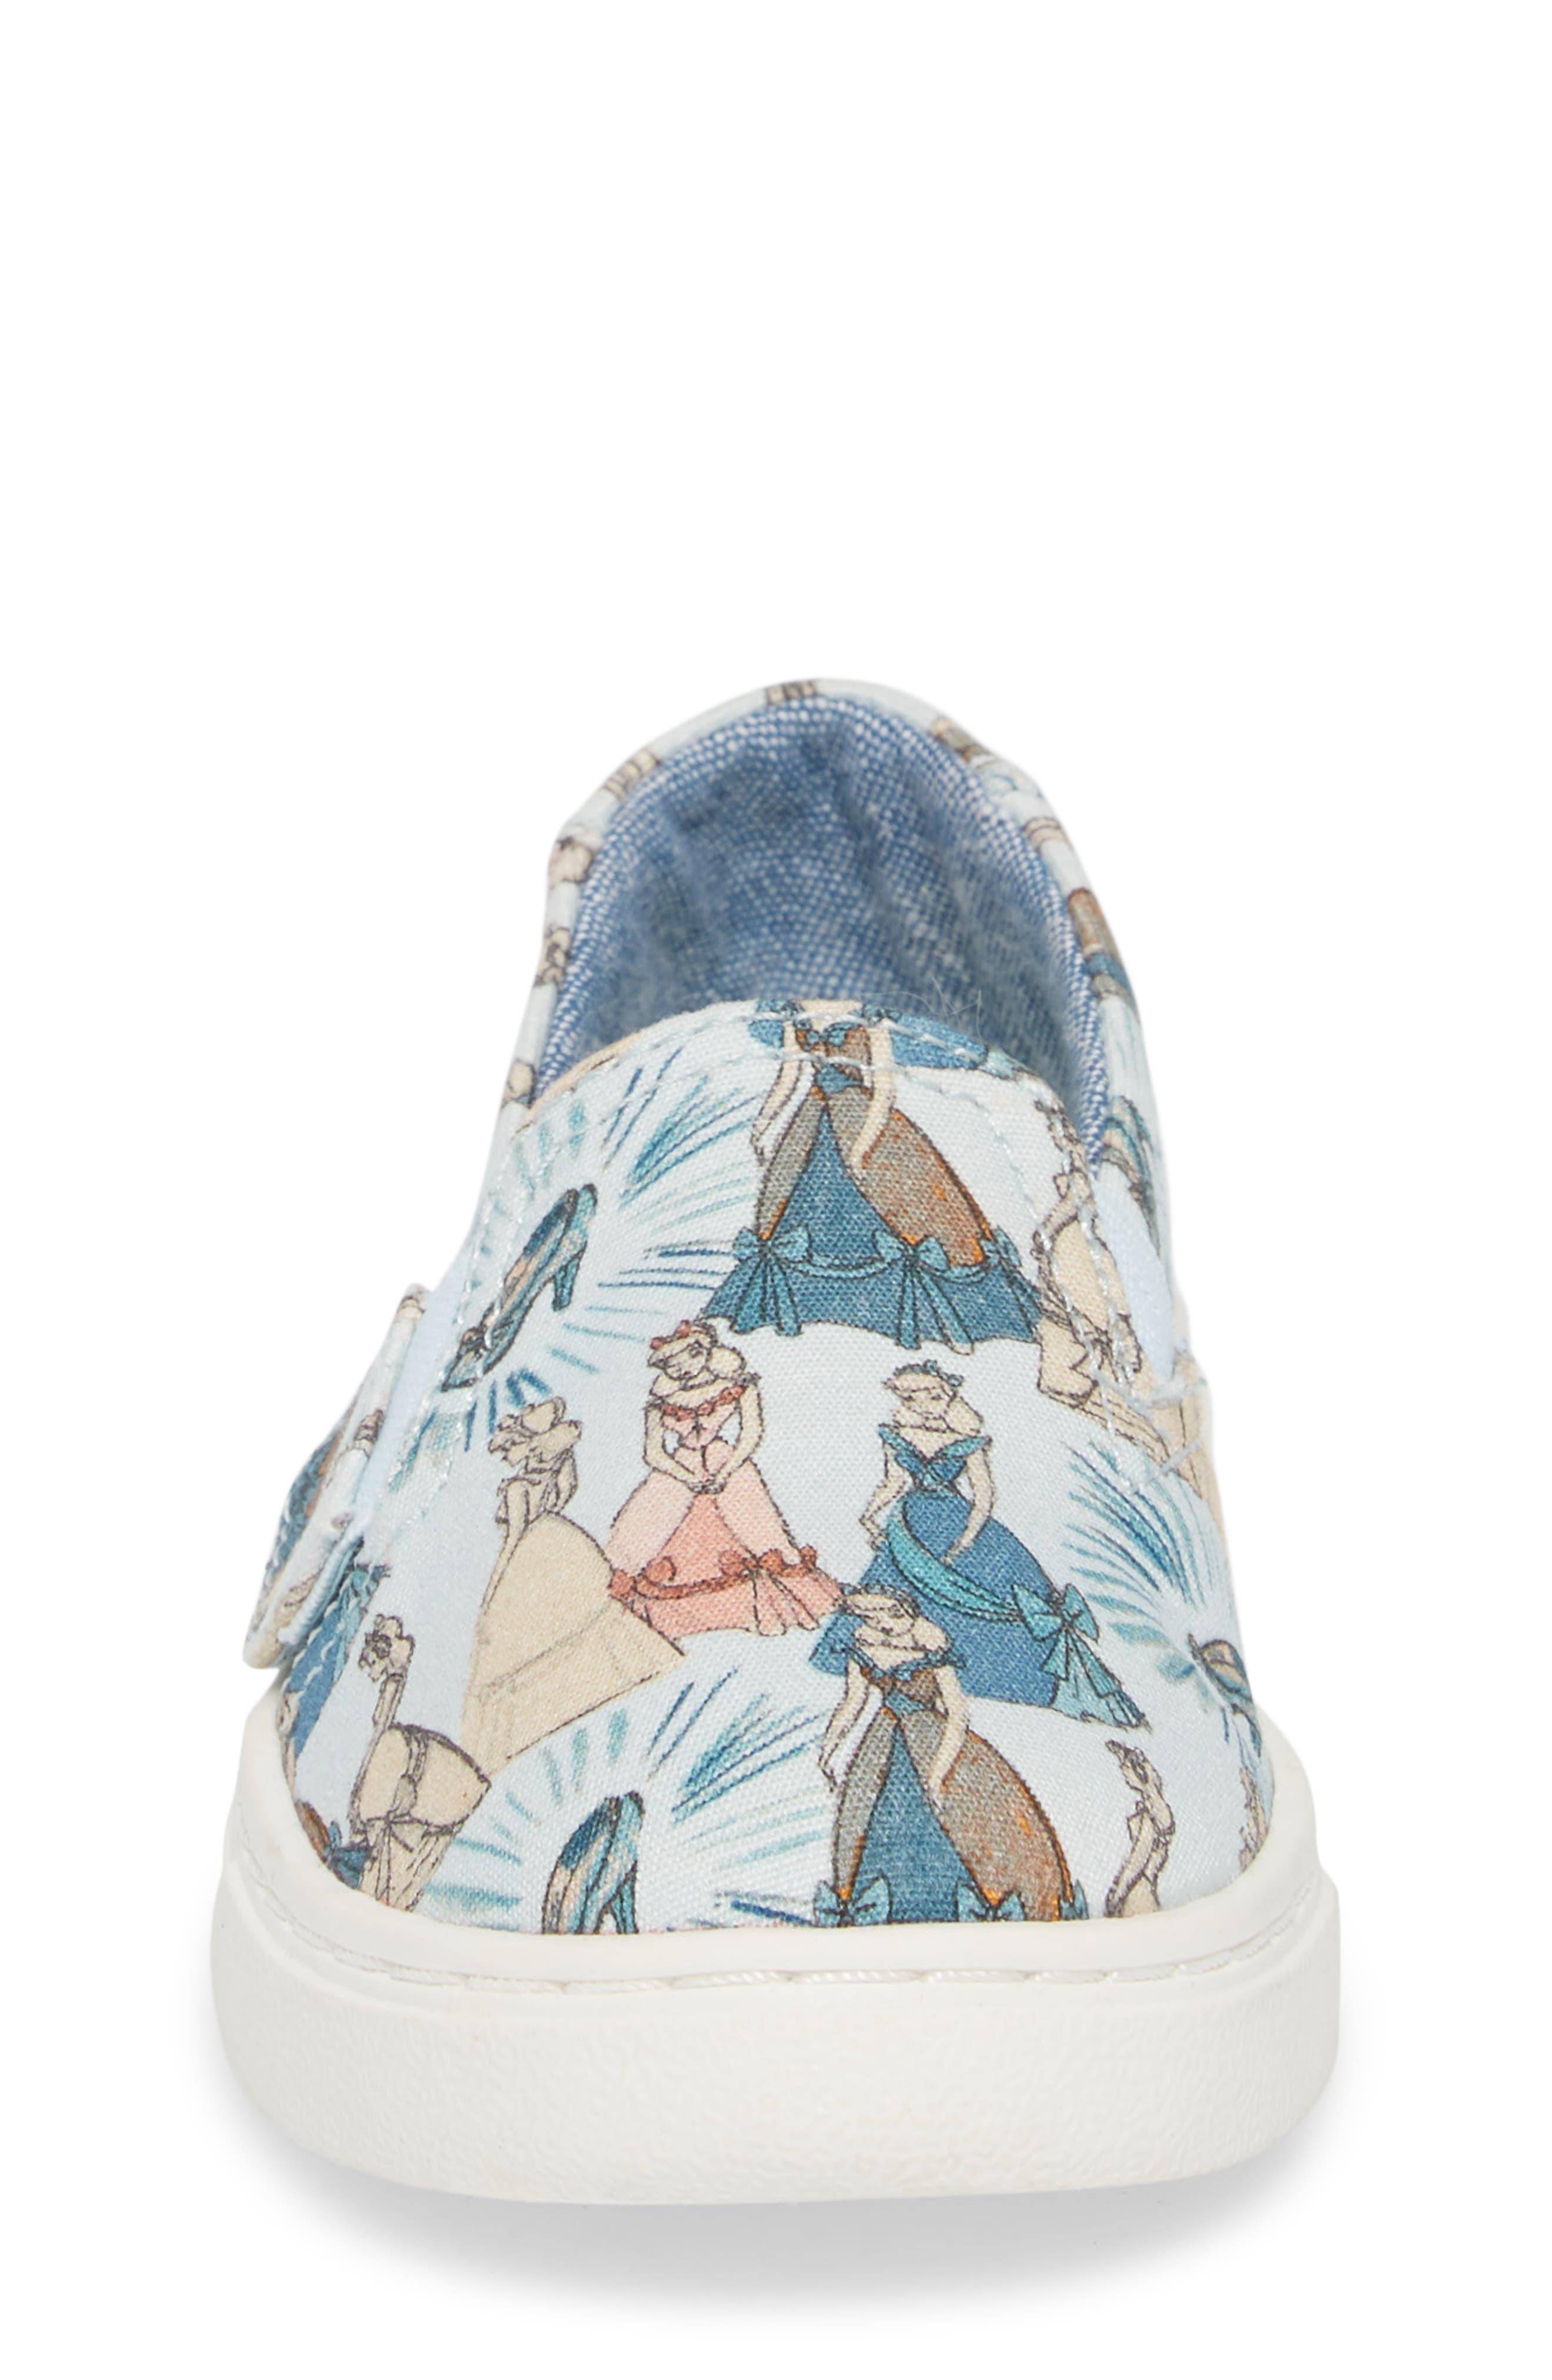 x Disney Luca Slip-On,                             Alternate thumbnail 4, color,                             CINDERELLA BLUE PRINT